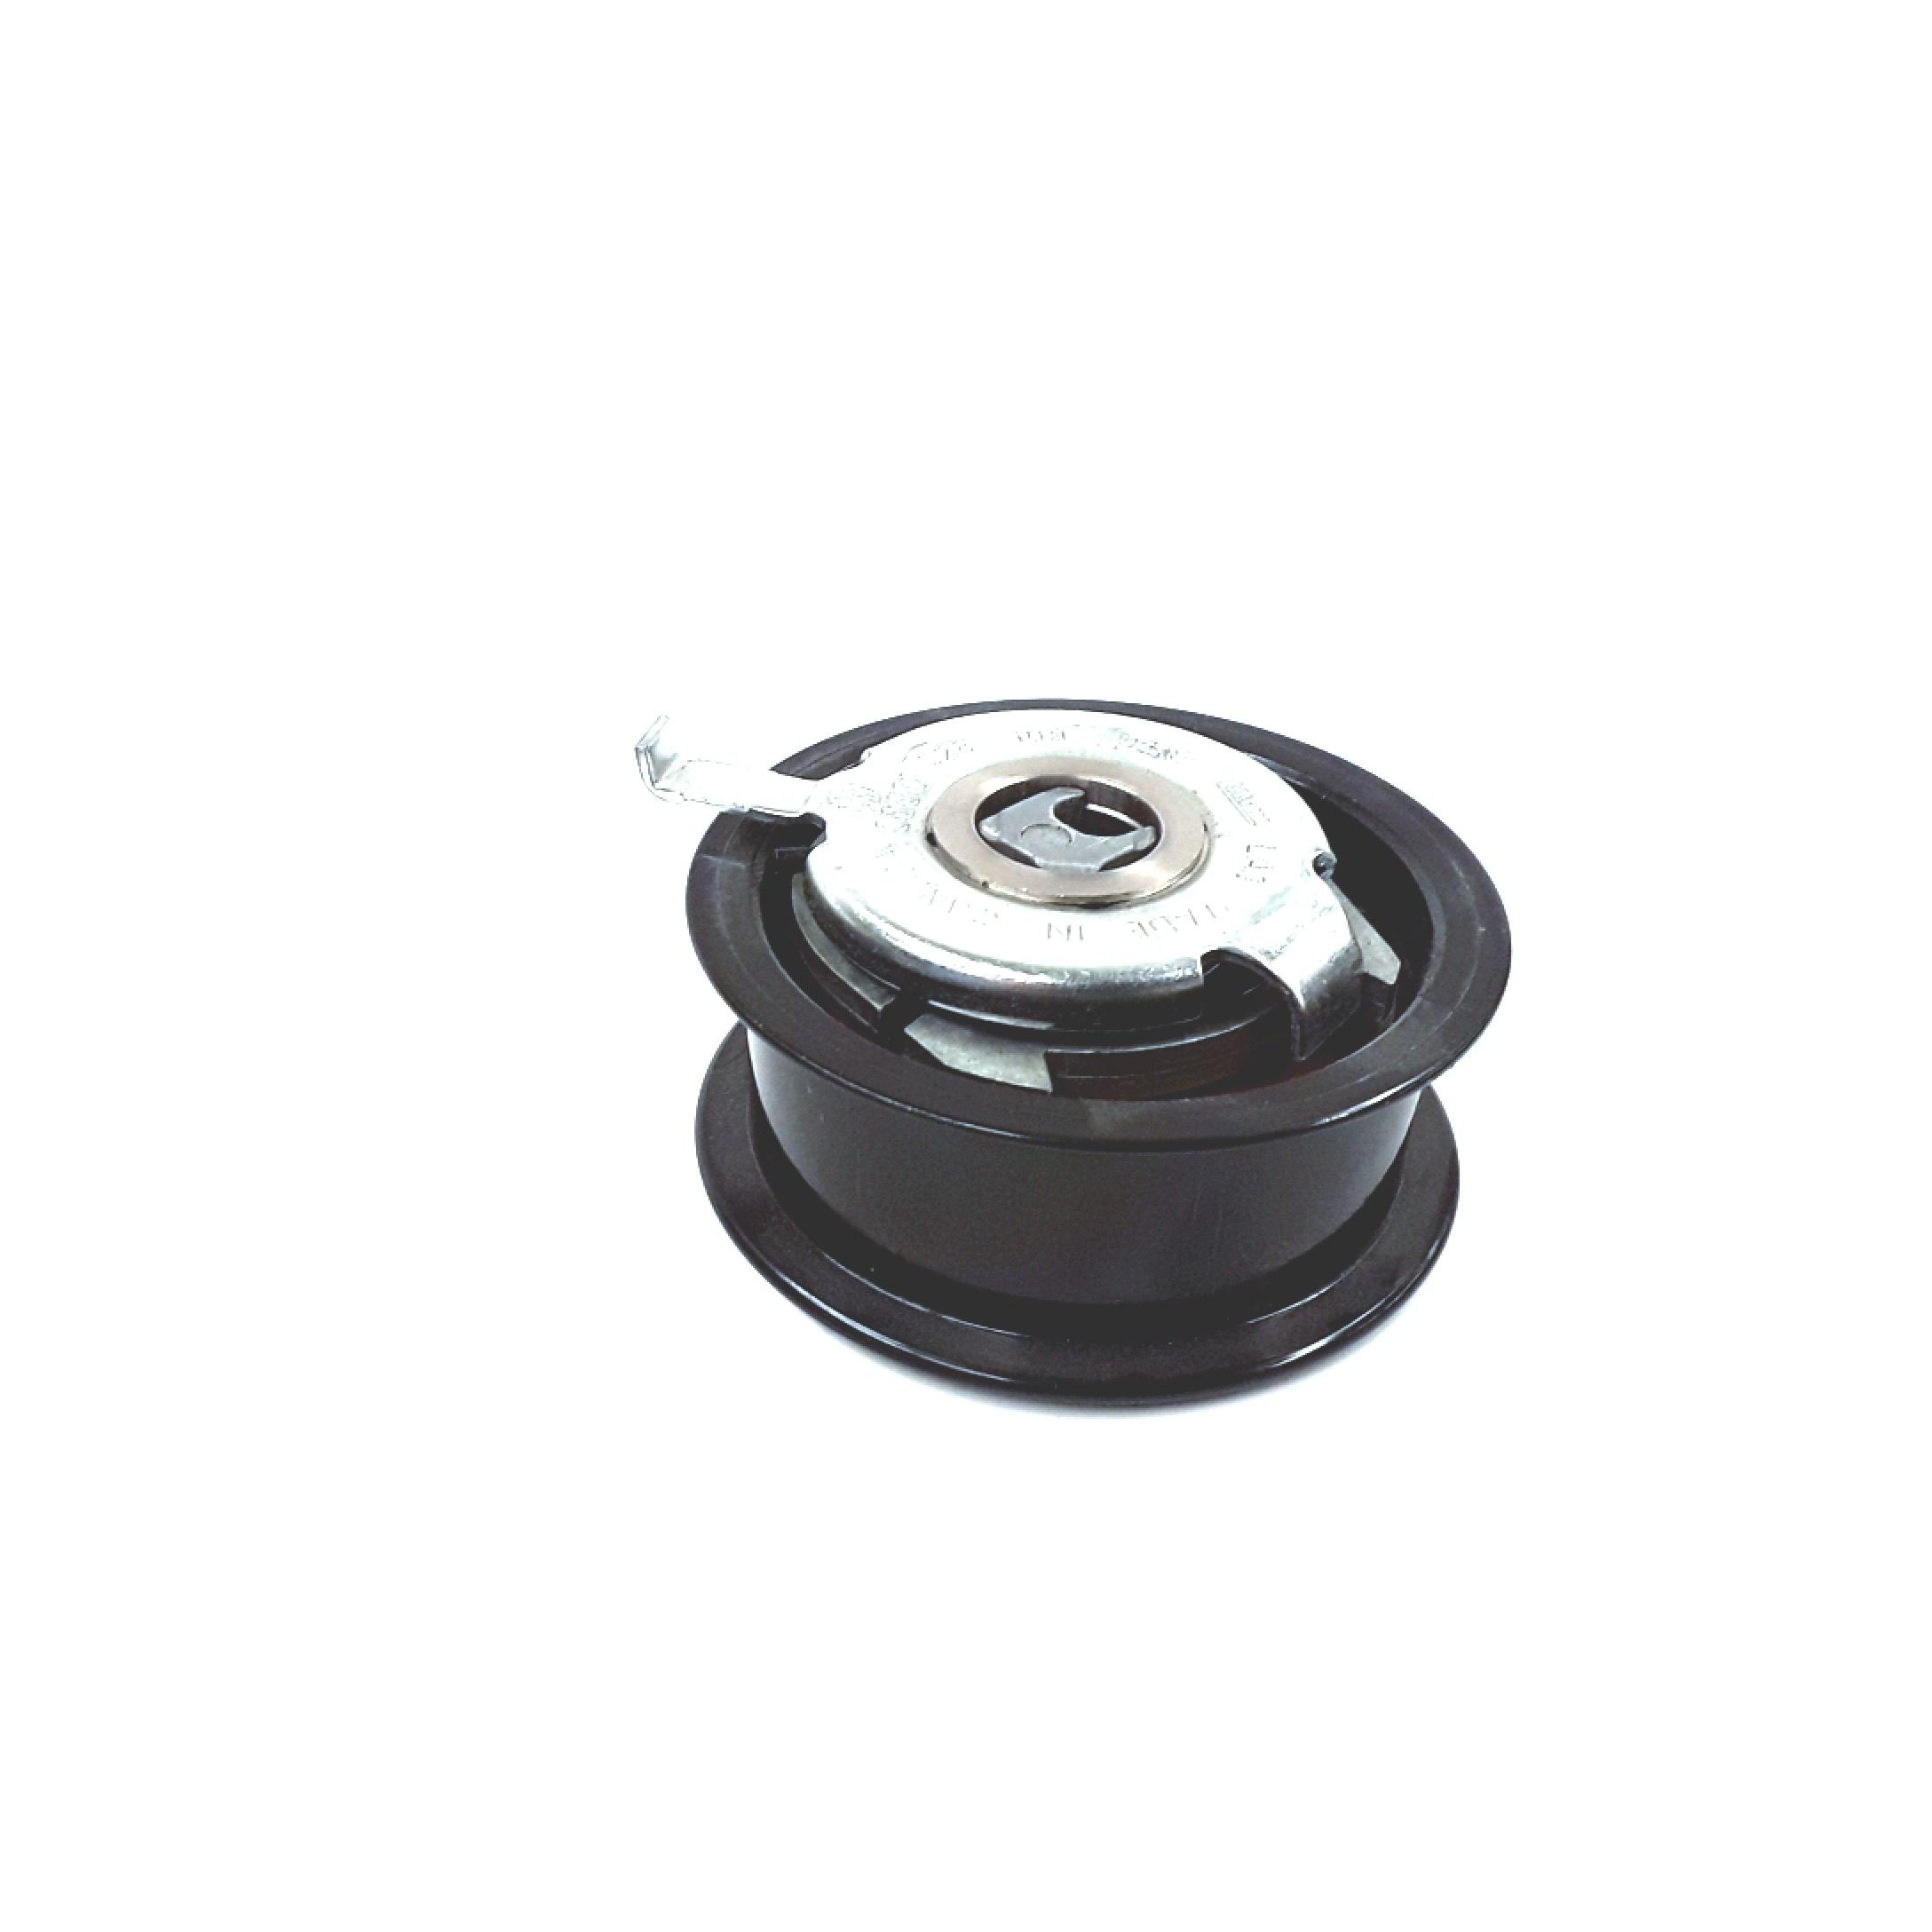 028109243f engine timing belt tensioner cabrio golf